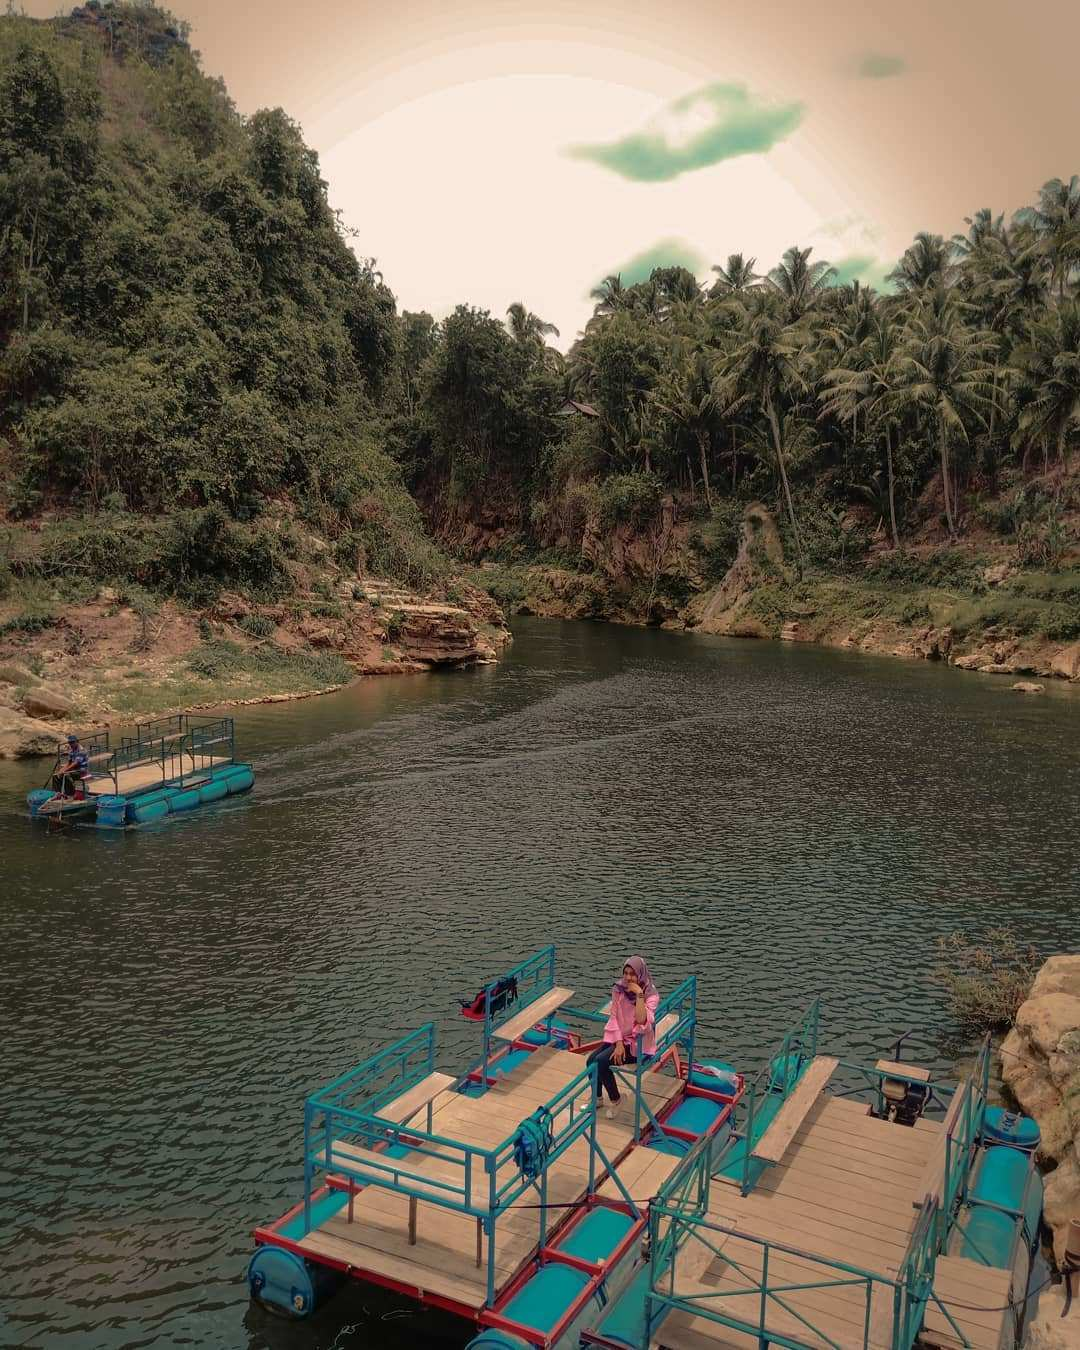 Alat Menyusuri Sungai Oya Menuju Air Terjun Sri Gethuk, Image From @enggarcarissa